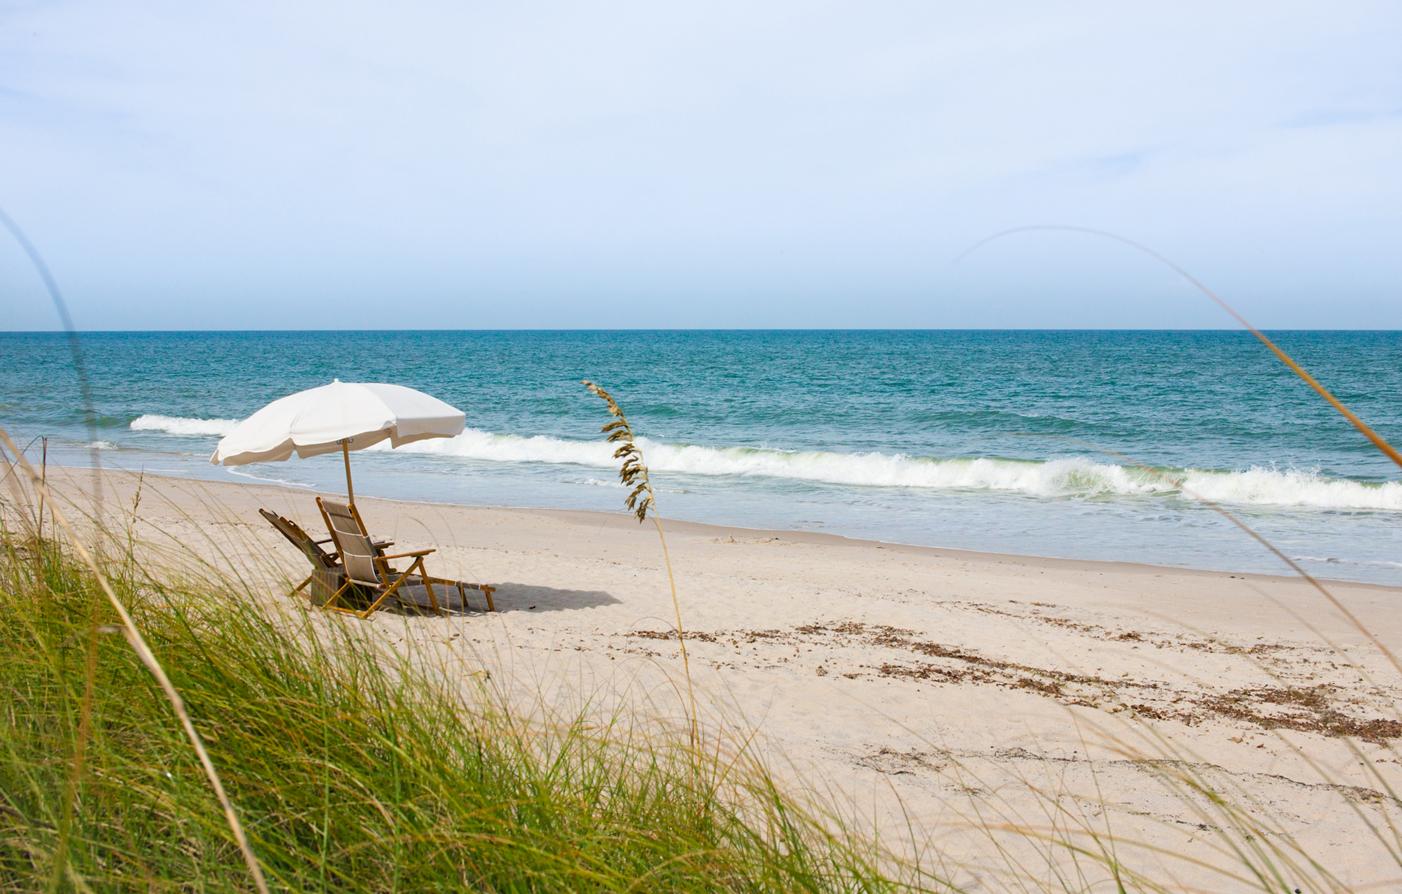 Vero Beach (FL) United States  city photos gallery : ... do in Vero Beach, Florida, United States Costa d'Este Beach Resort